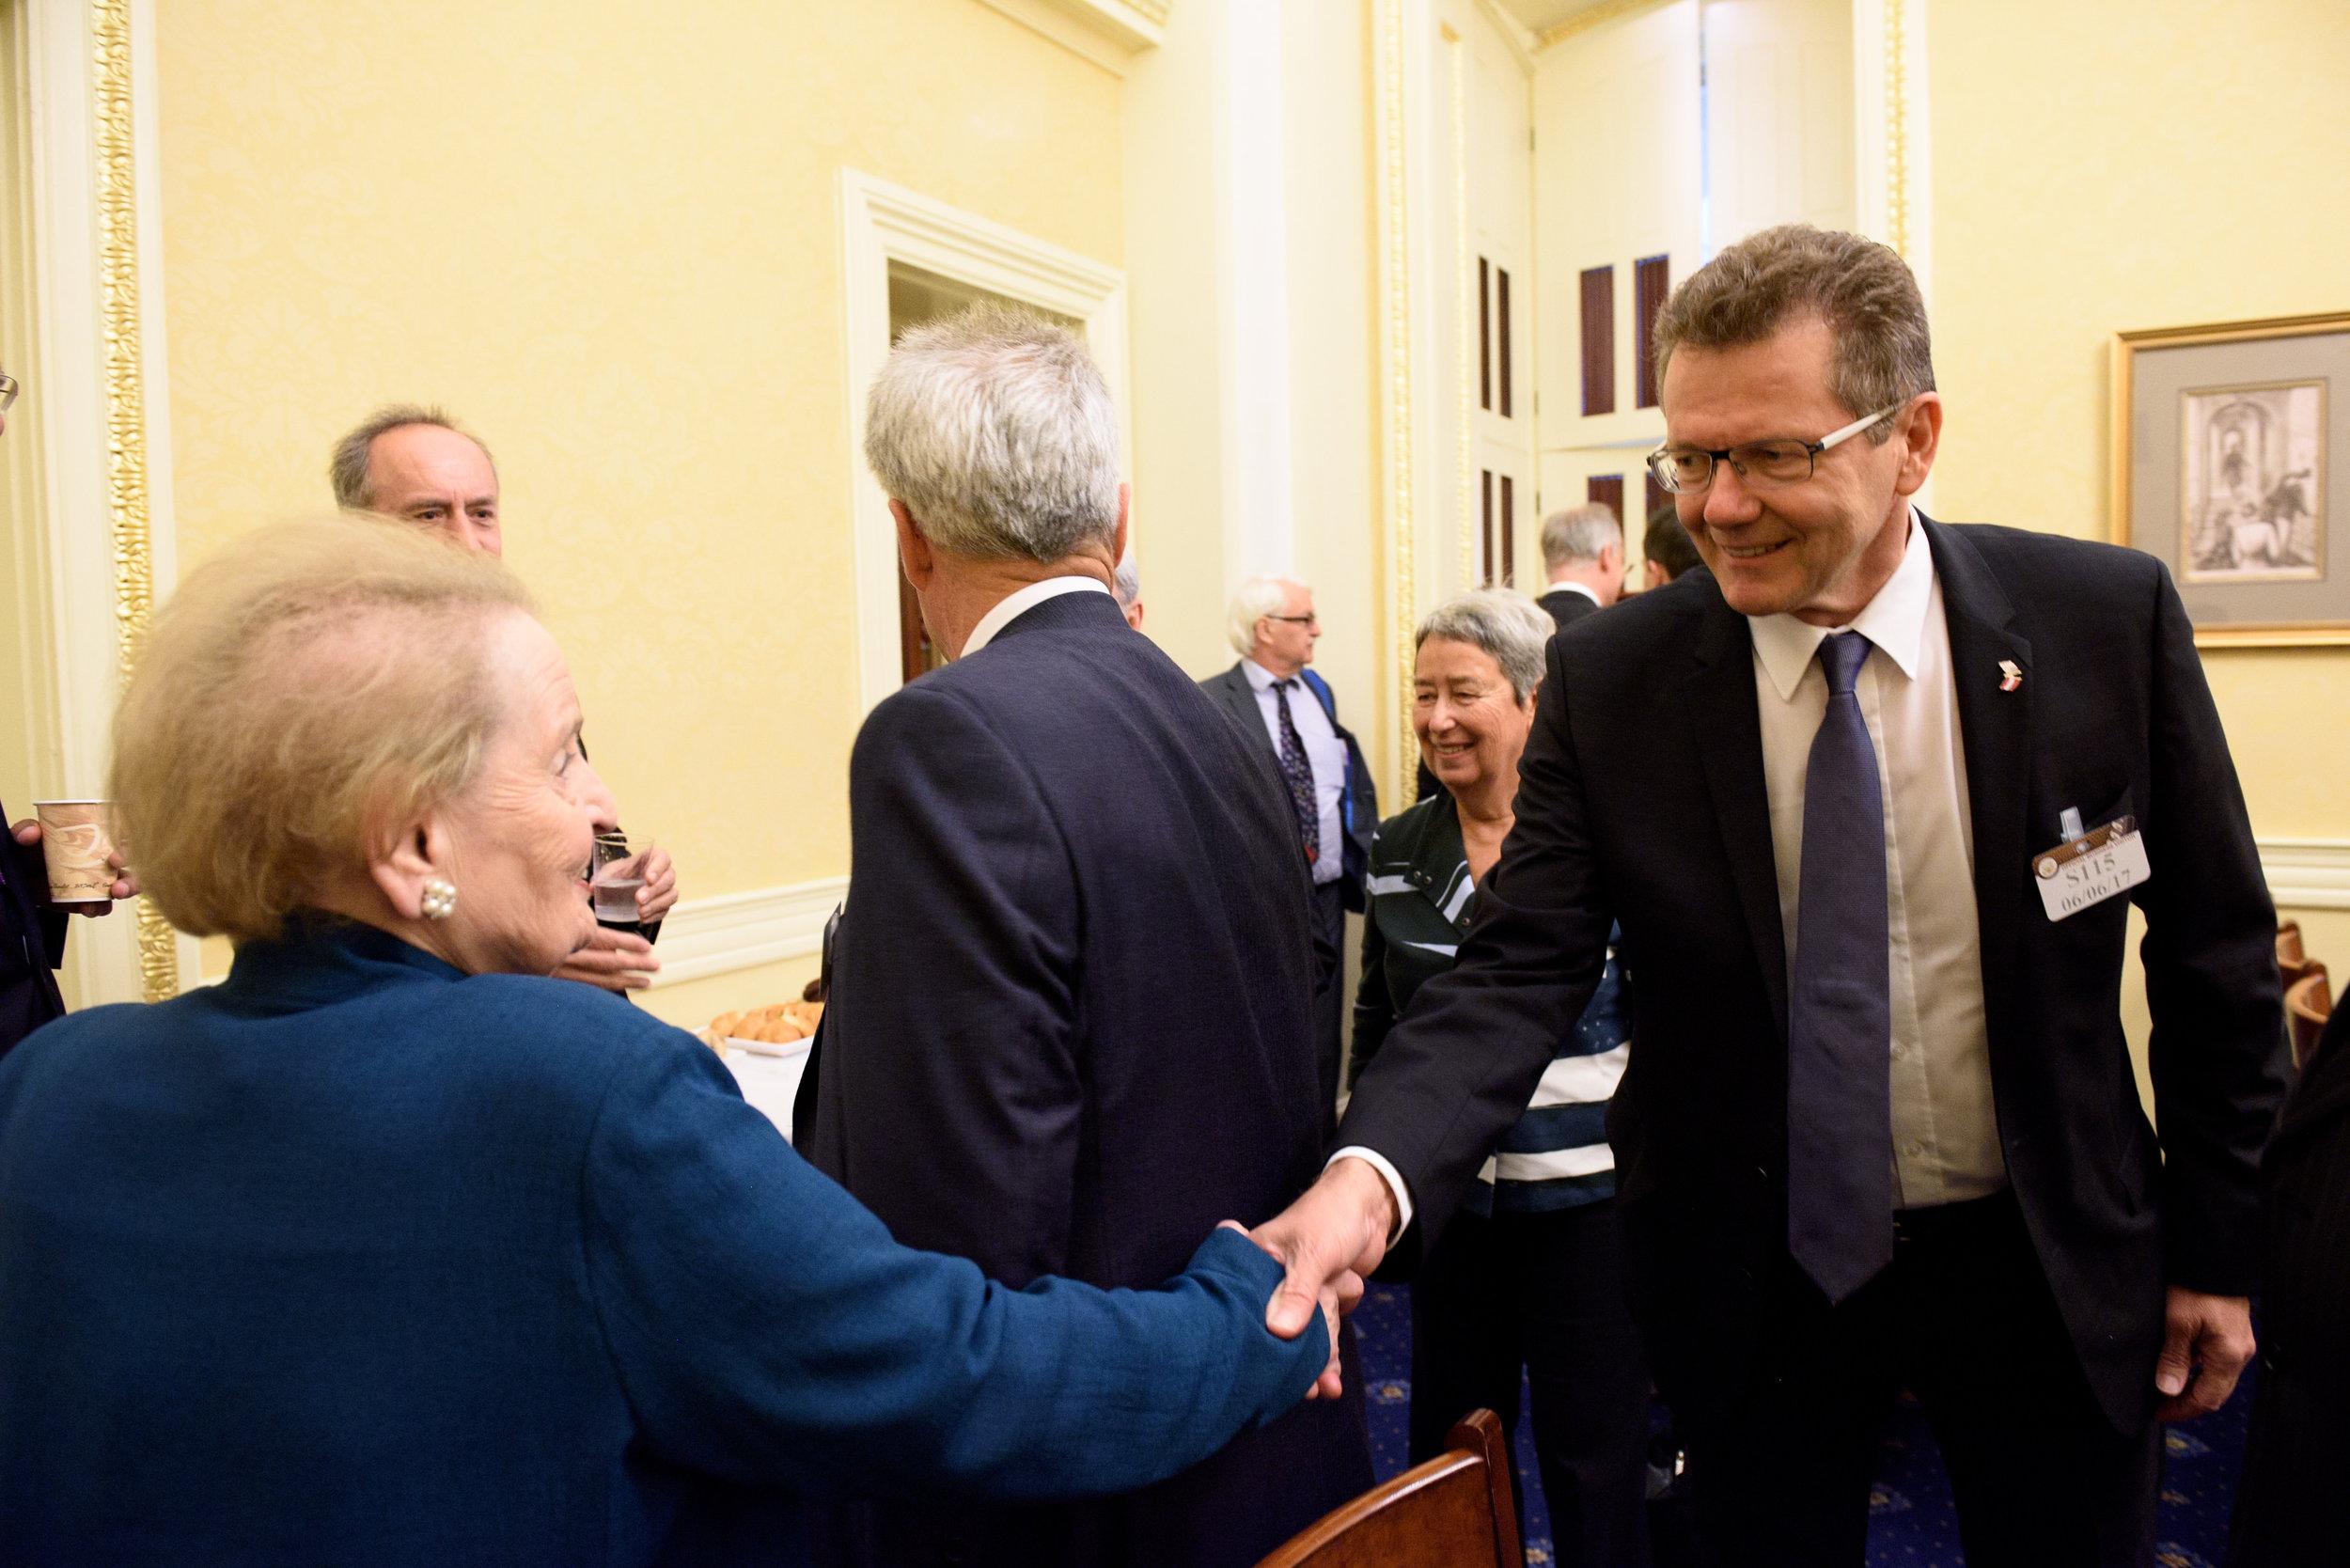 Austrian Ambassador to the U.S. Wolfgang Waldner (right) meeting Madame Secretary Madeleine Albright (c)Kaveh Sardari Photography